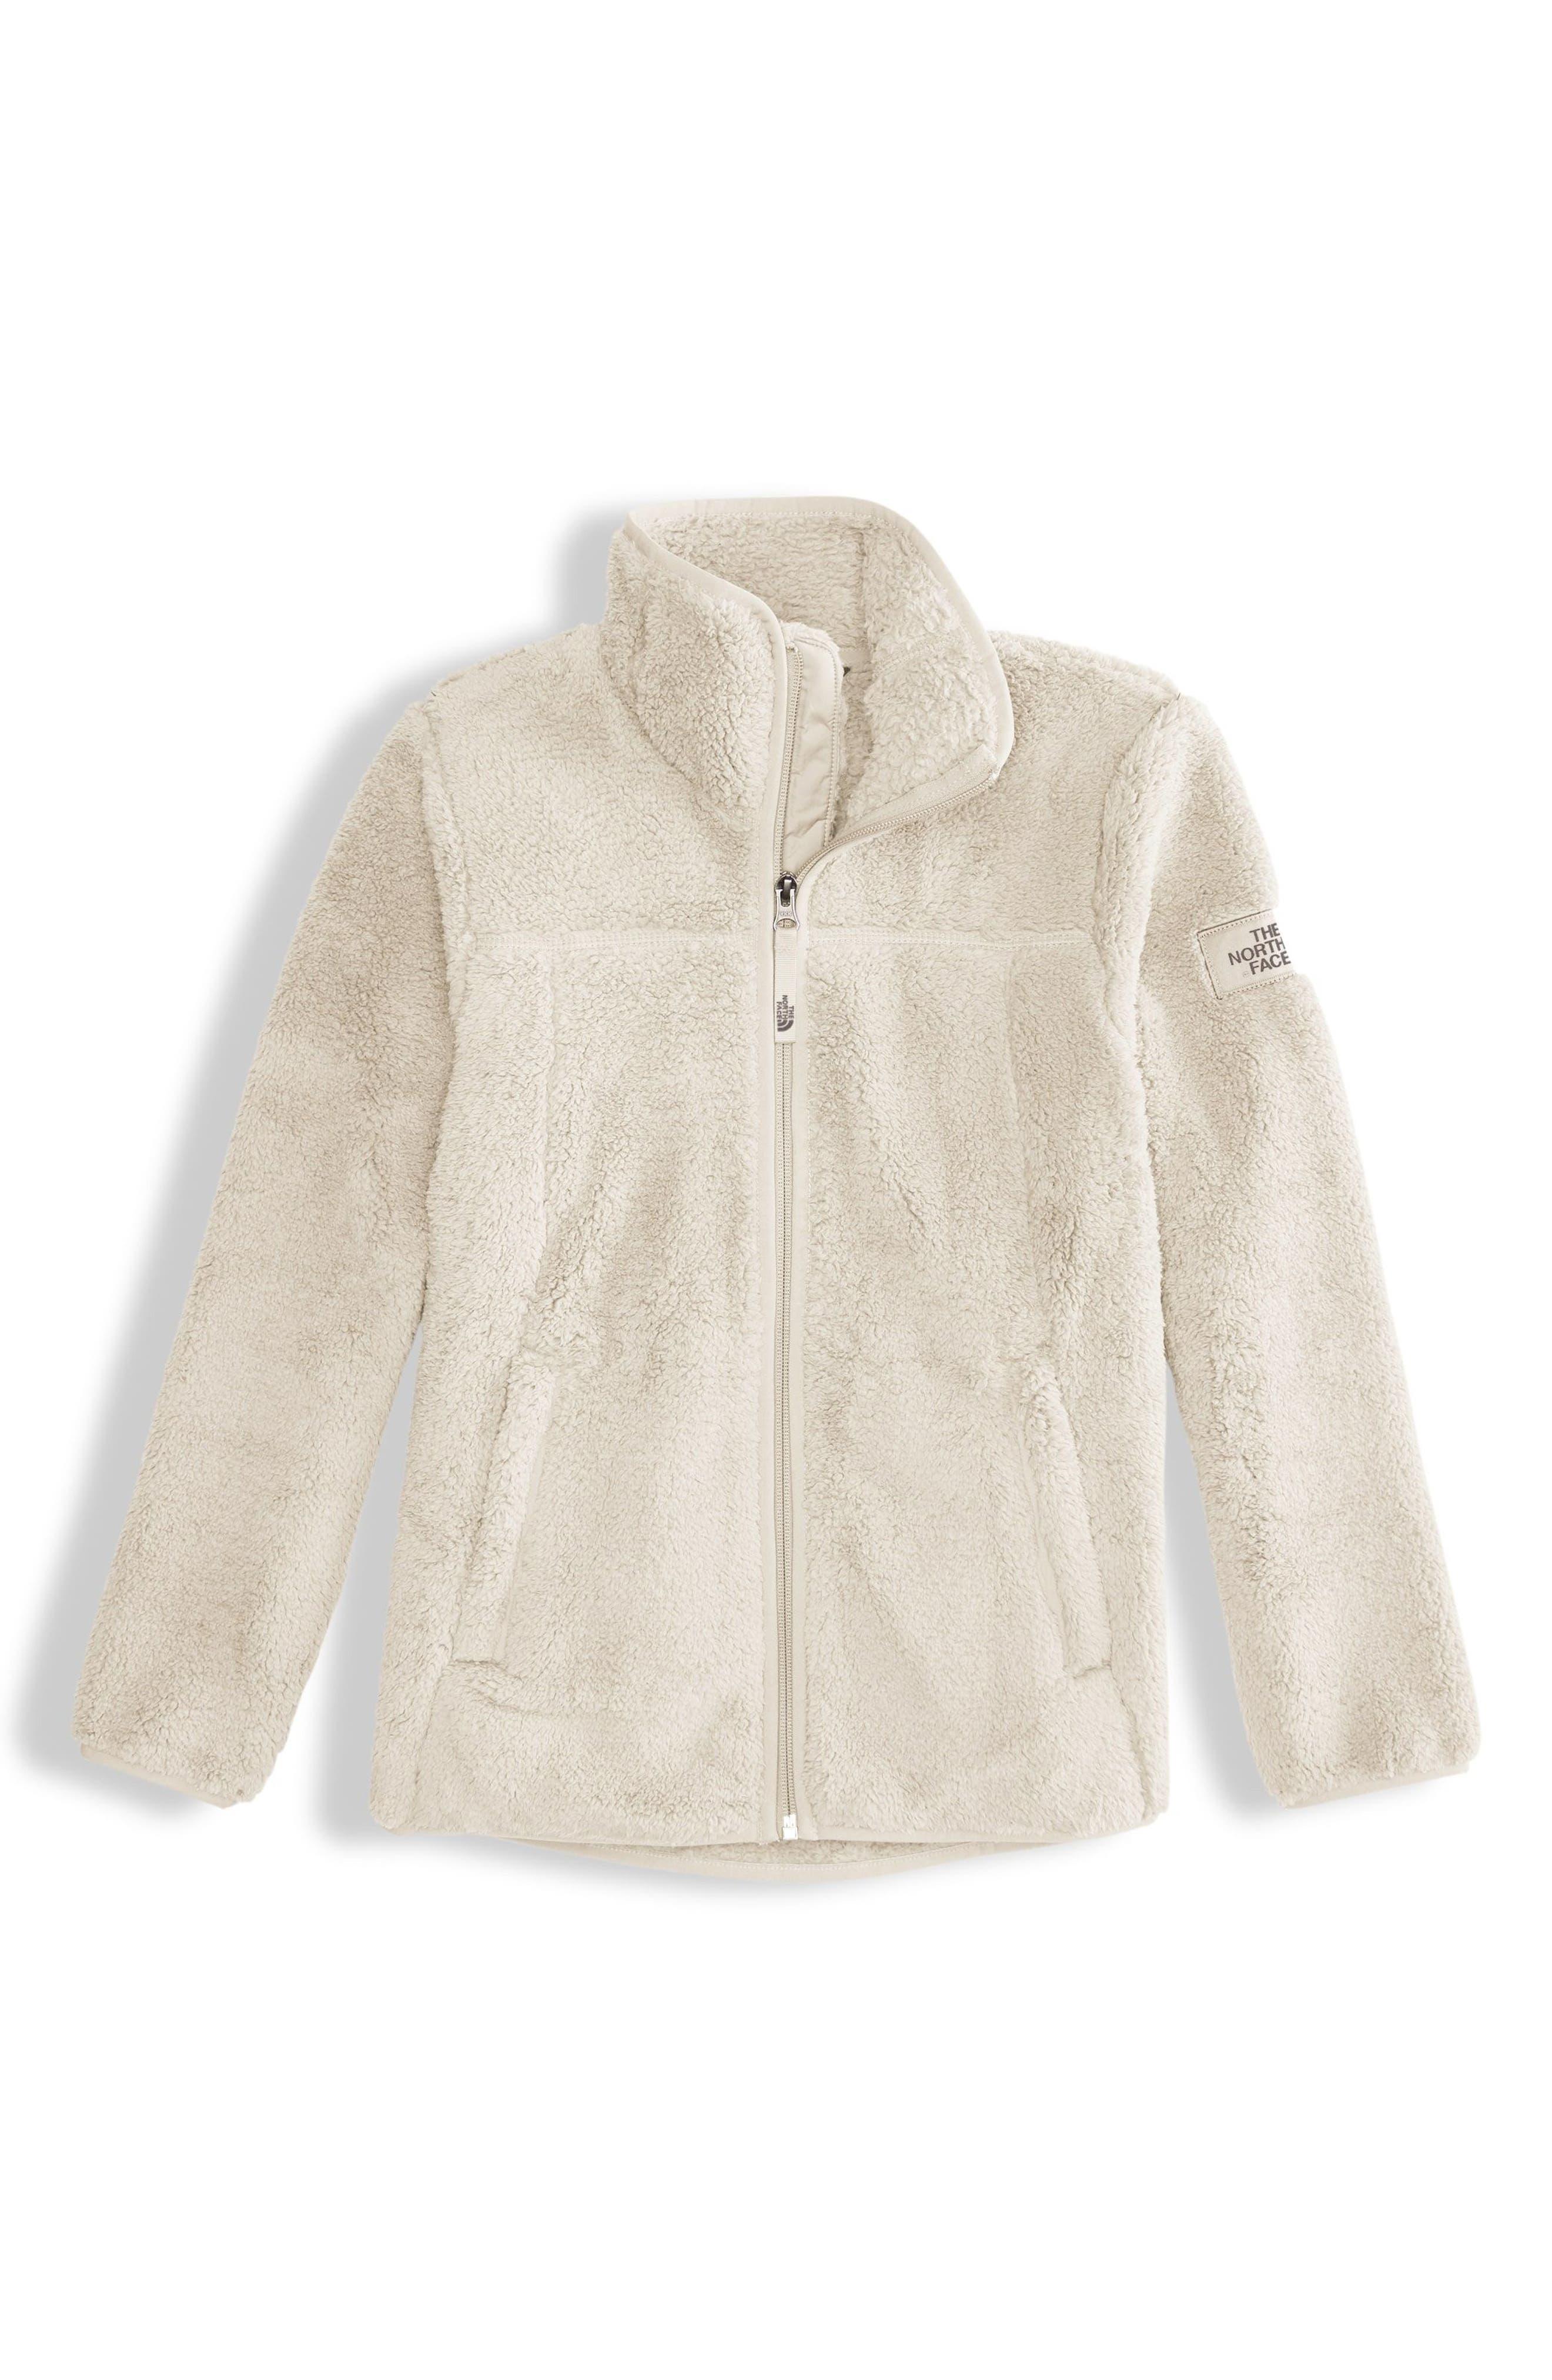 Campshire Fleece Jacket,                         Main,                         color, VINTAGE WHITE